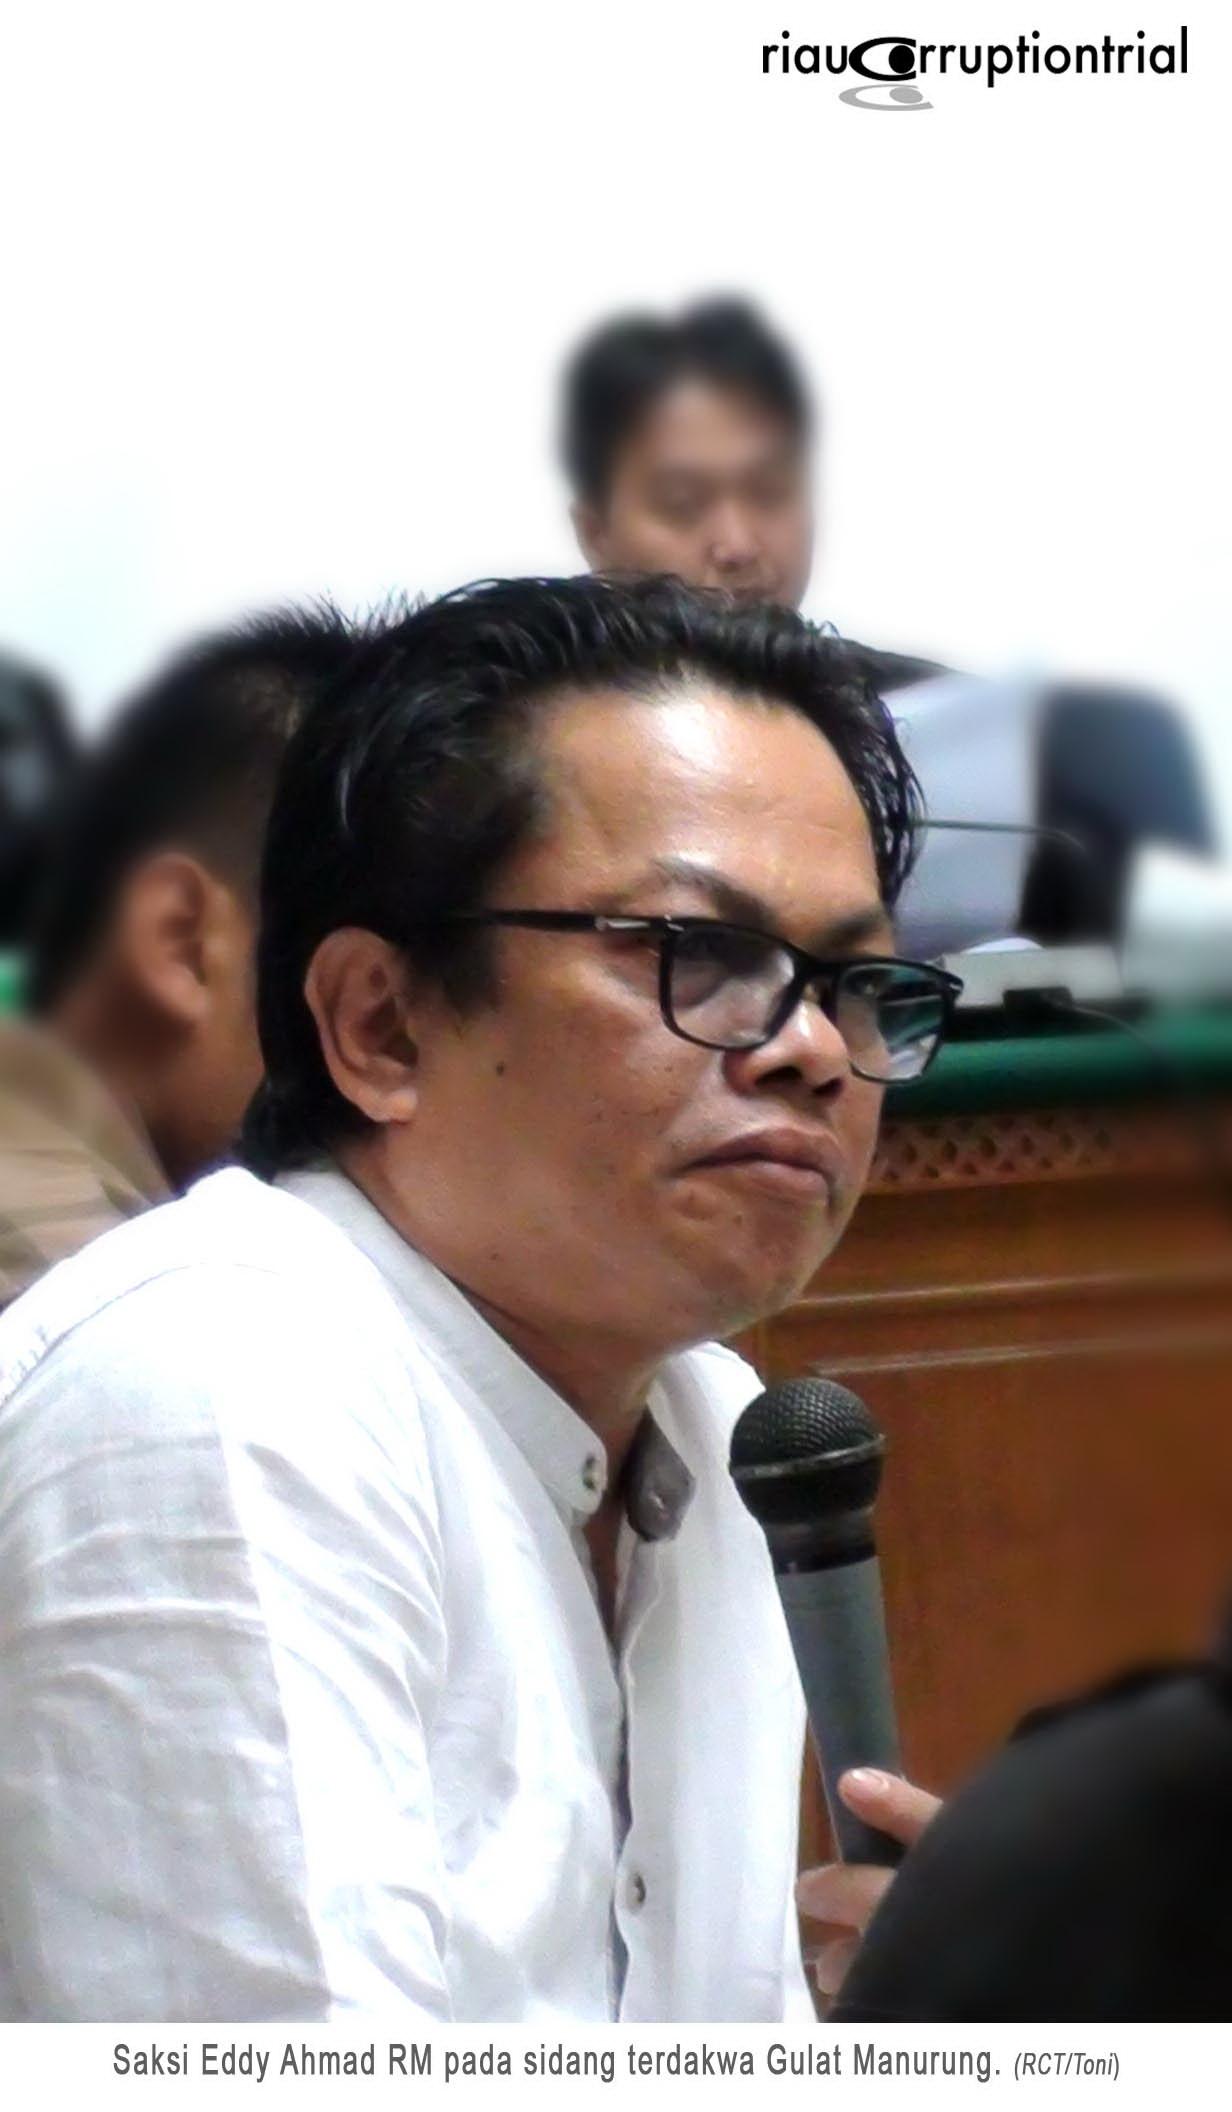 08 Saksi Eddy Ahmad RM 22 Desember 2014